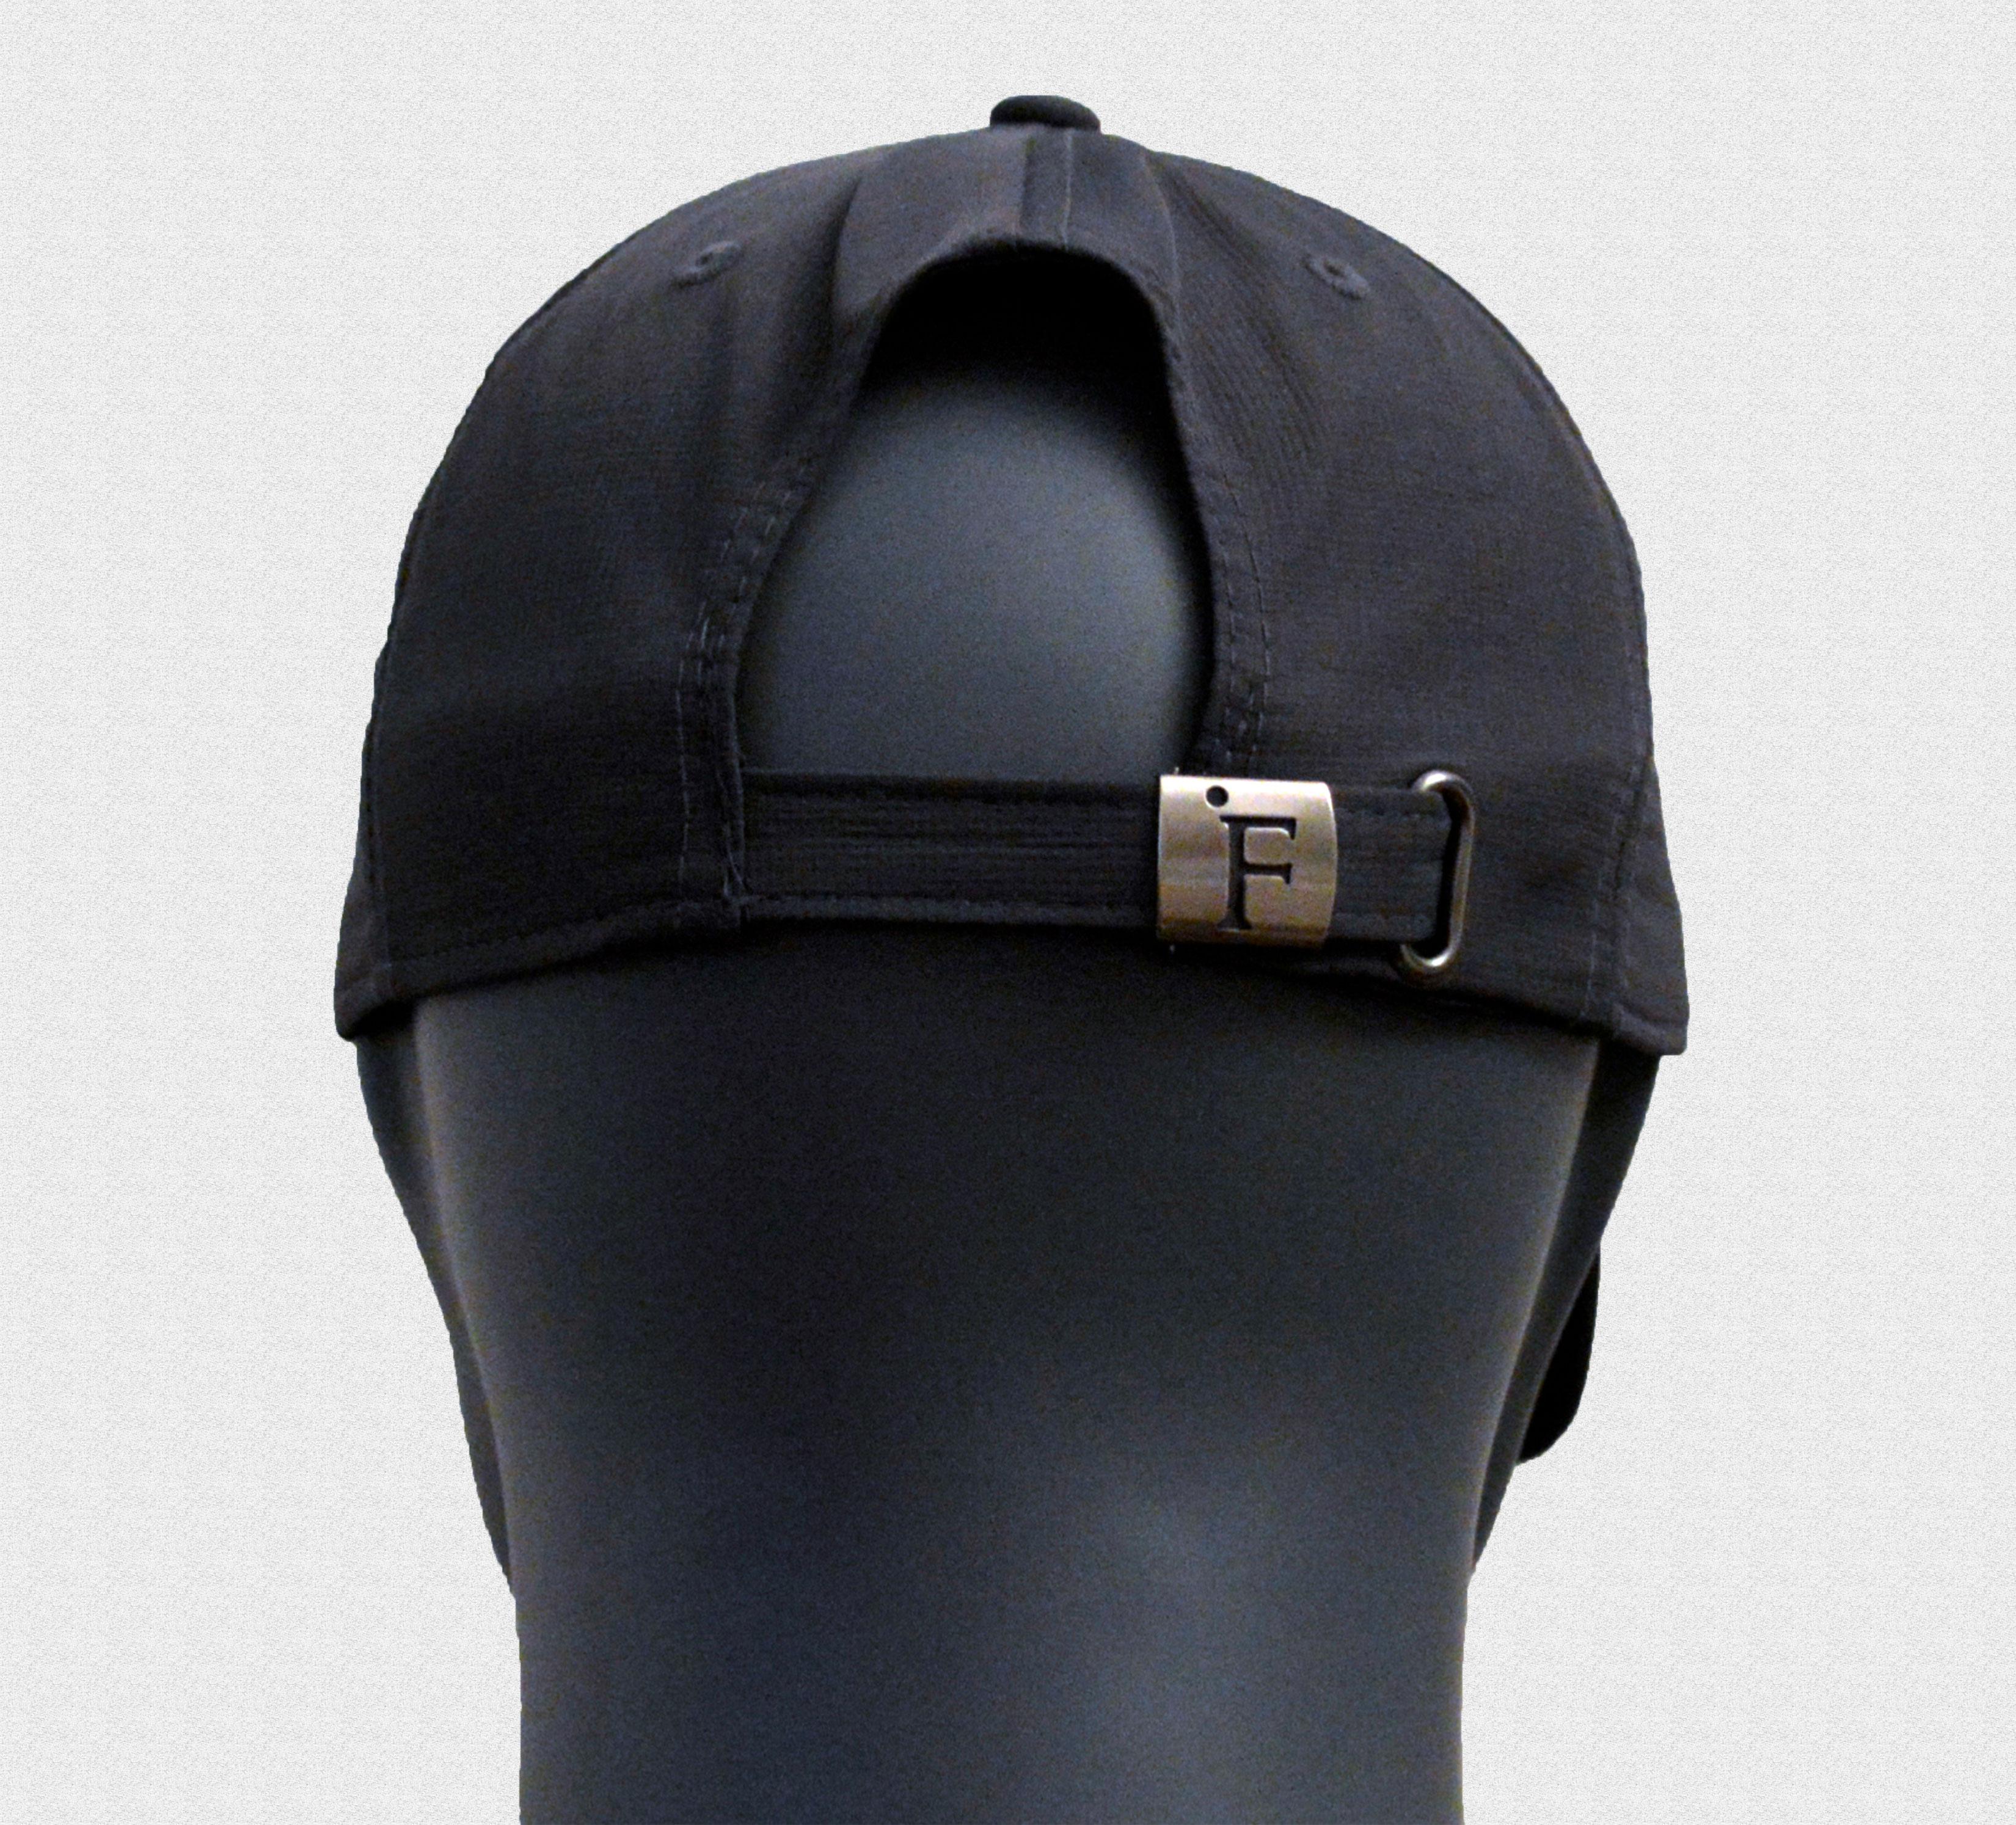 New Nike Ed Hats Hat Hd Image Ukjugs 28670 8a306 82240a83edb1